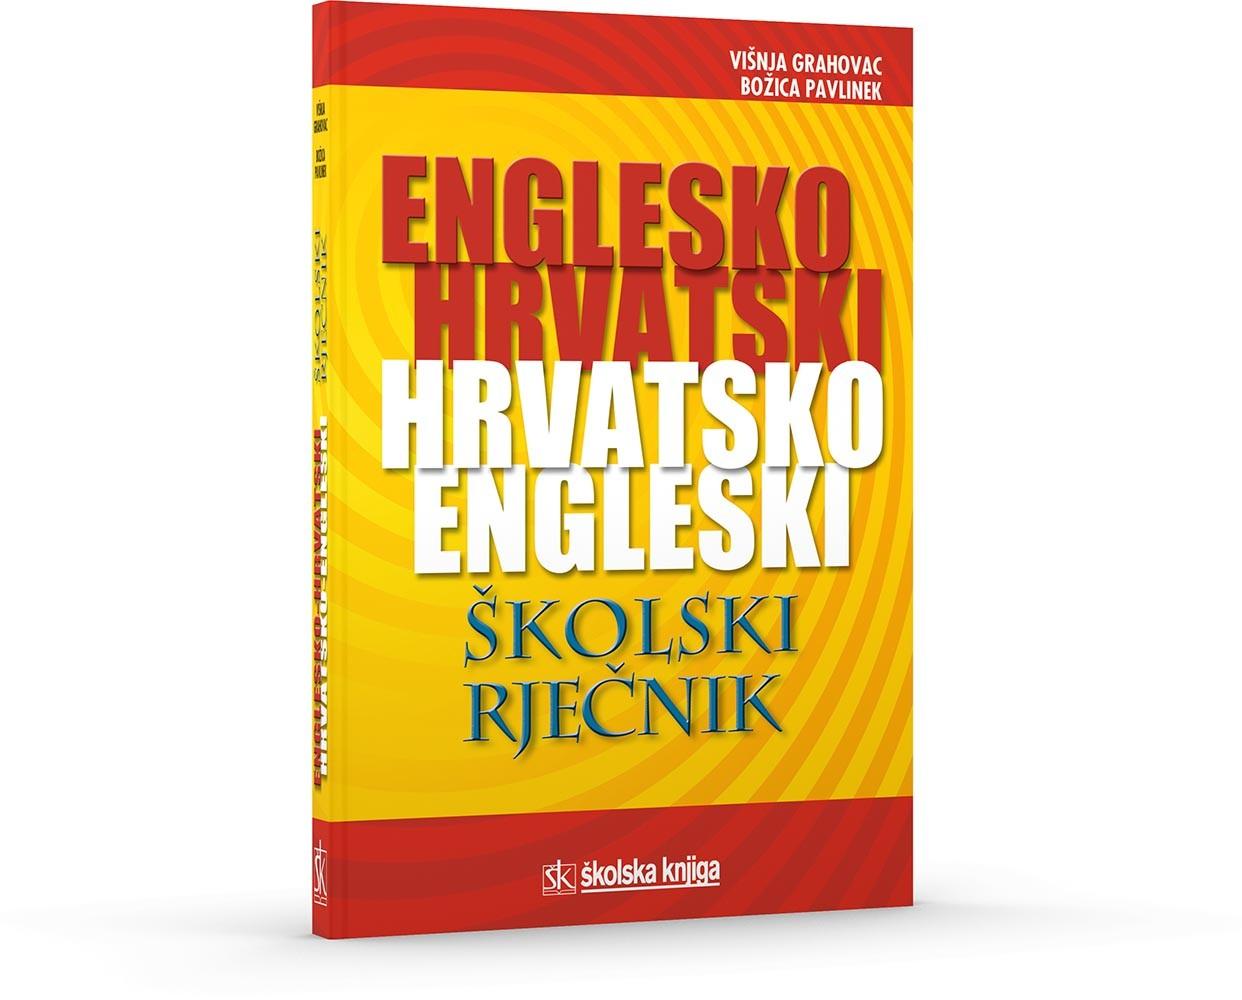 Englesko-hrvatski i hrvatsko-engleski školski rječnik